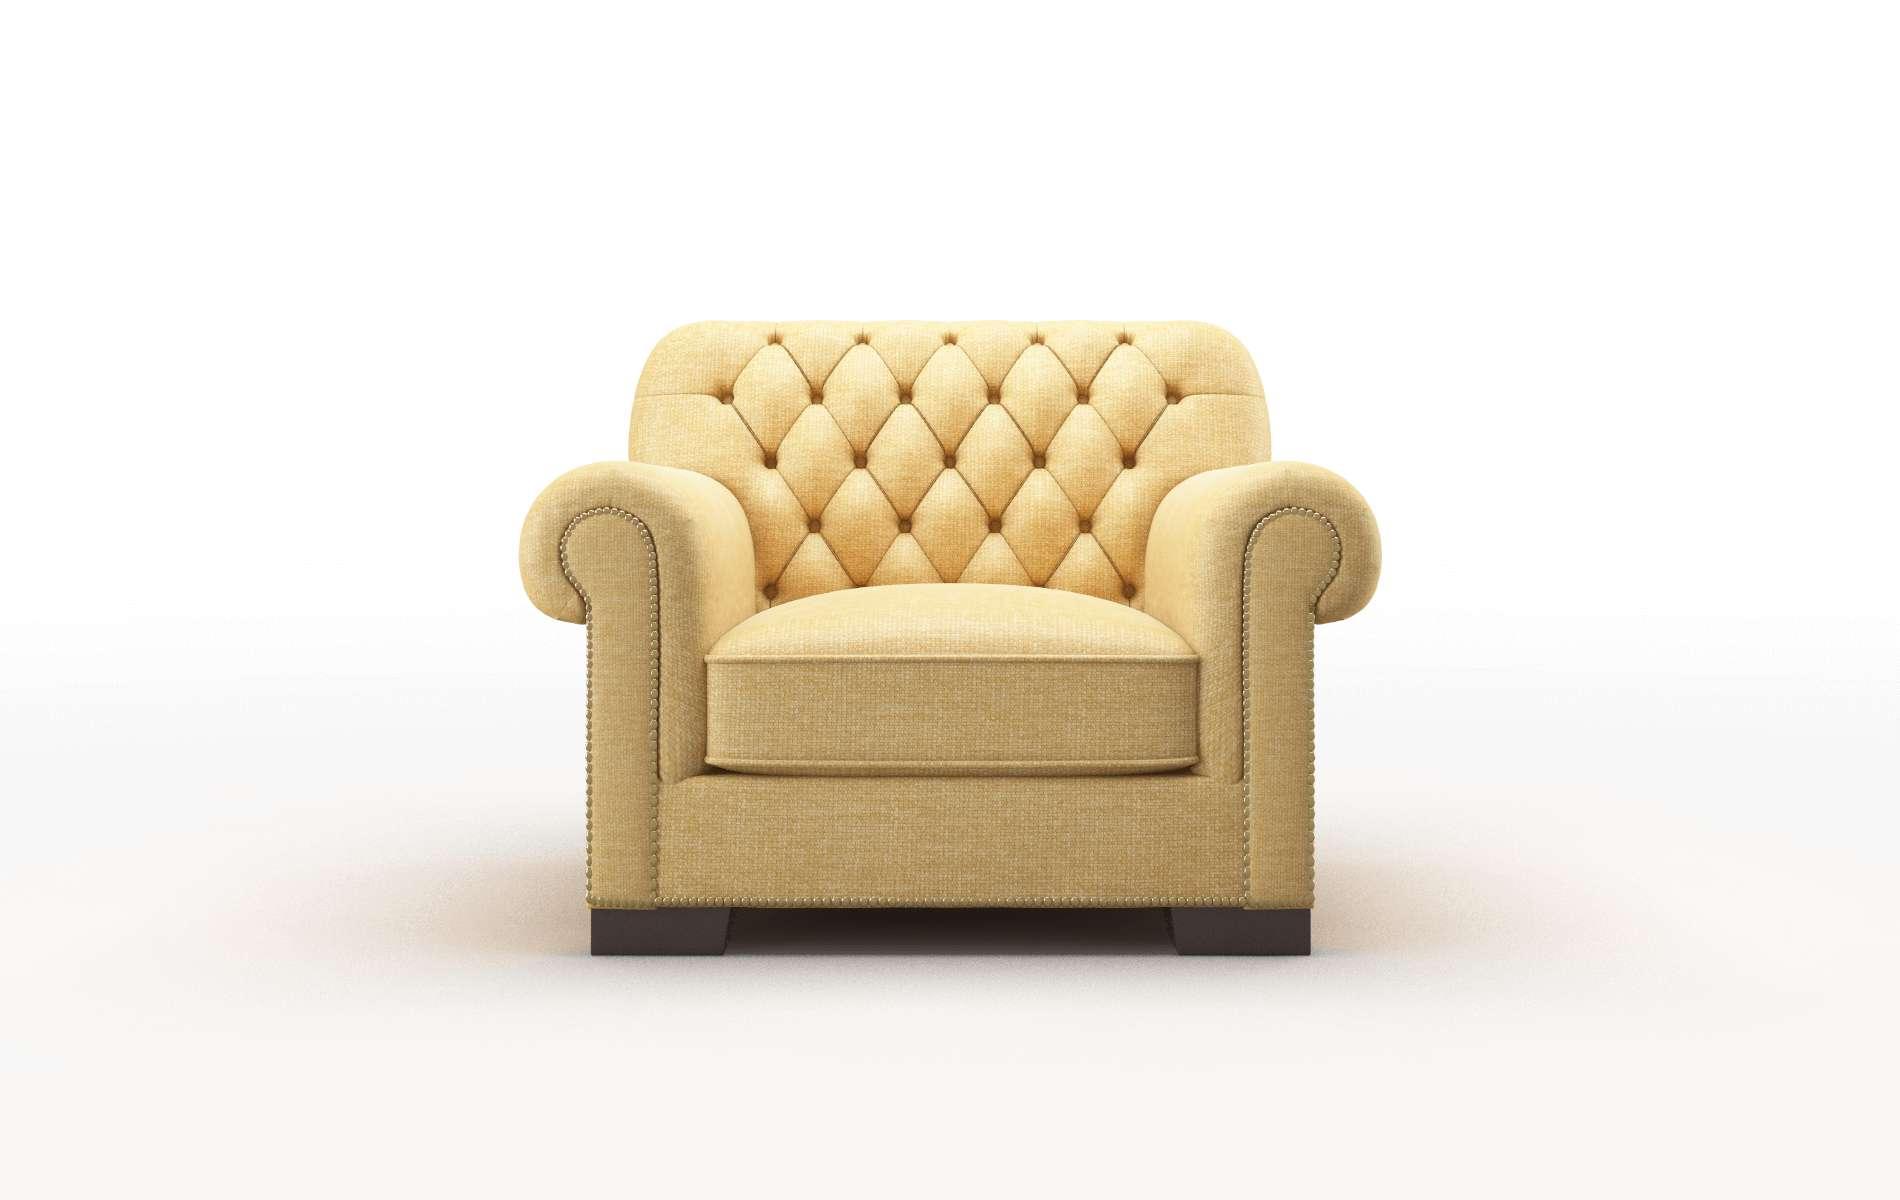 Chester Keylargo Honey chair espresso legs